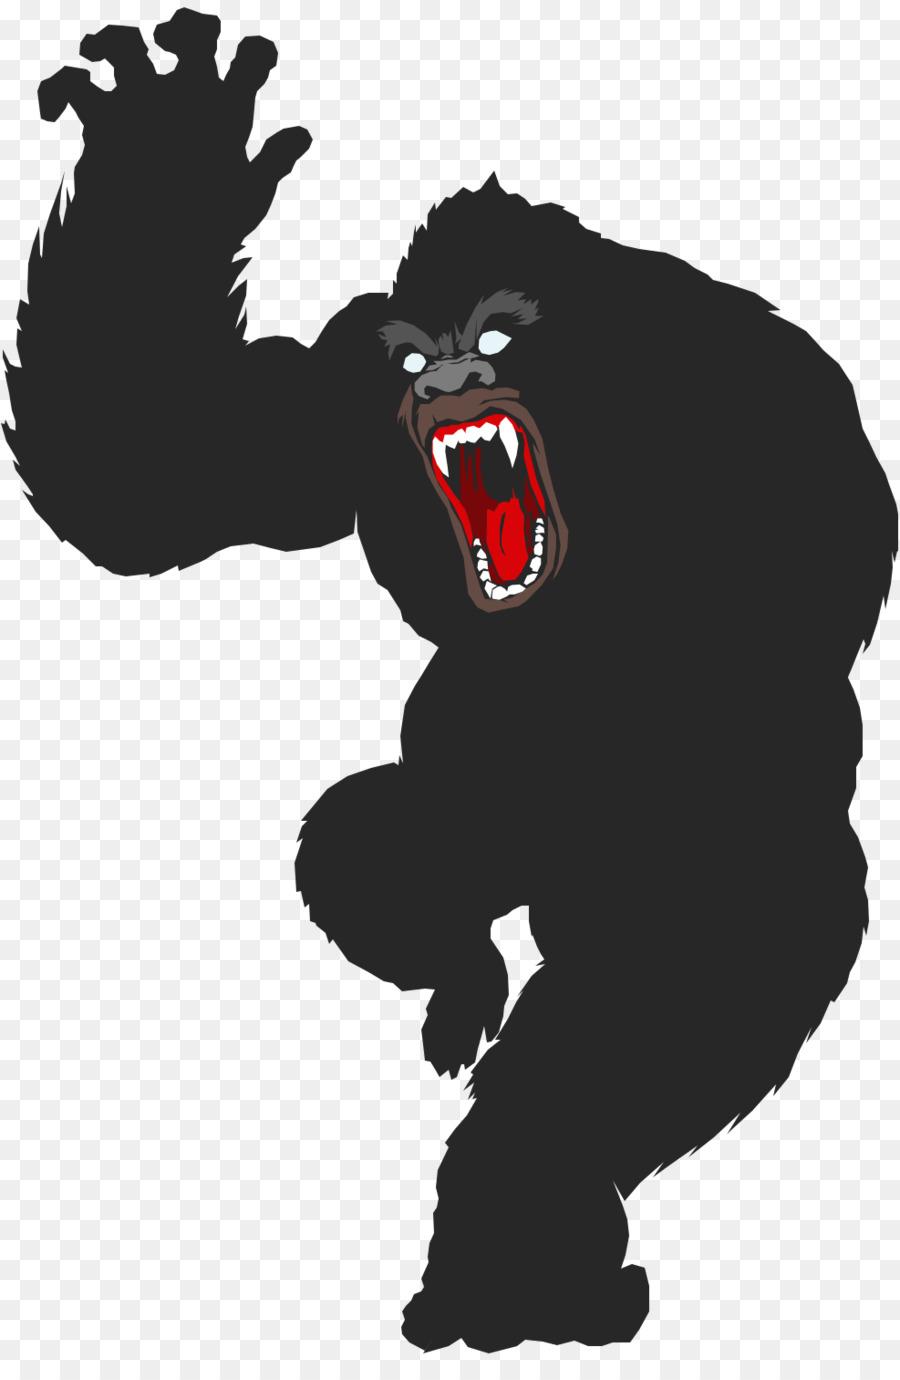 900x1380 Gorilla King Kong Ape Primate